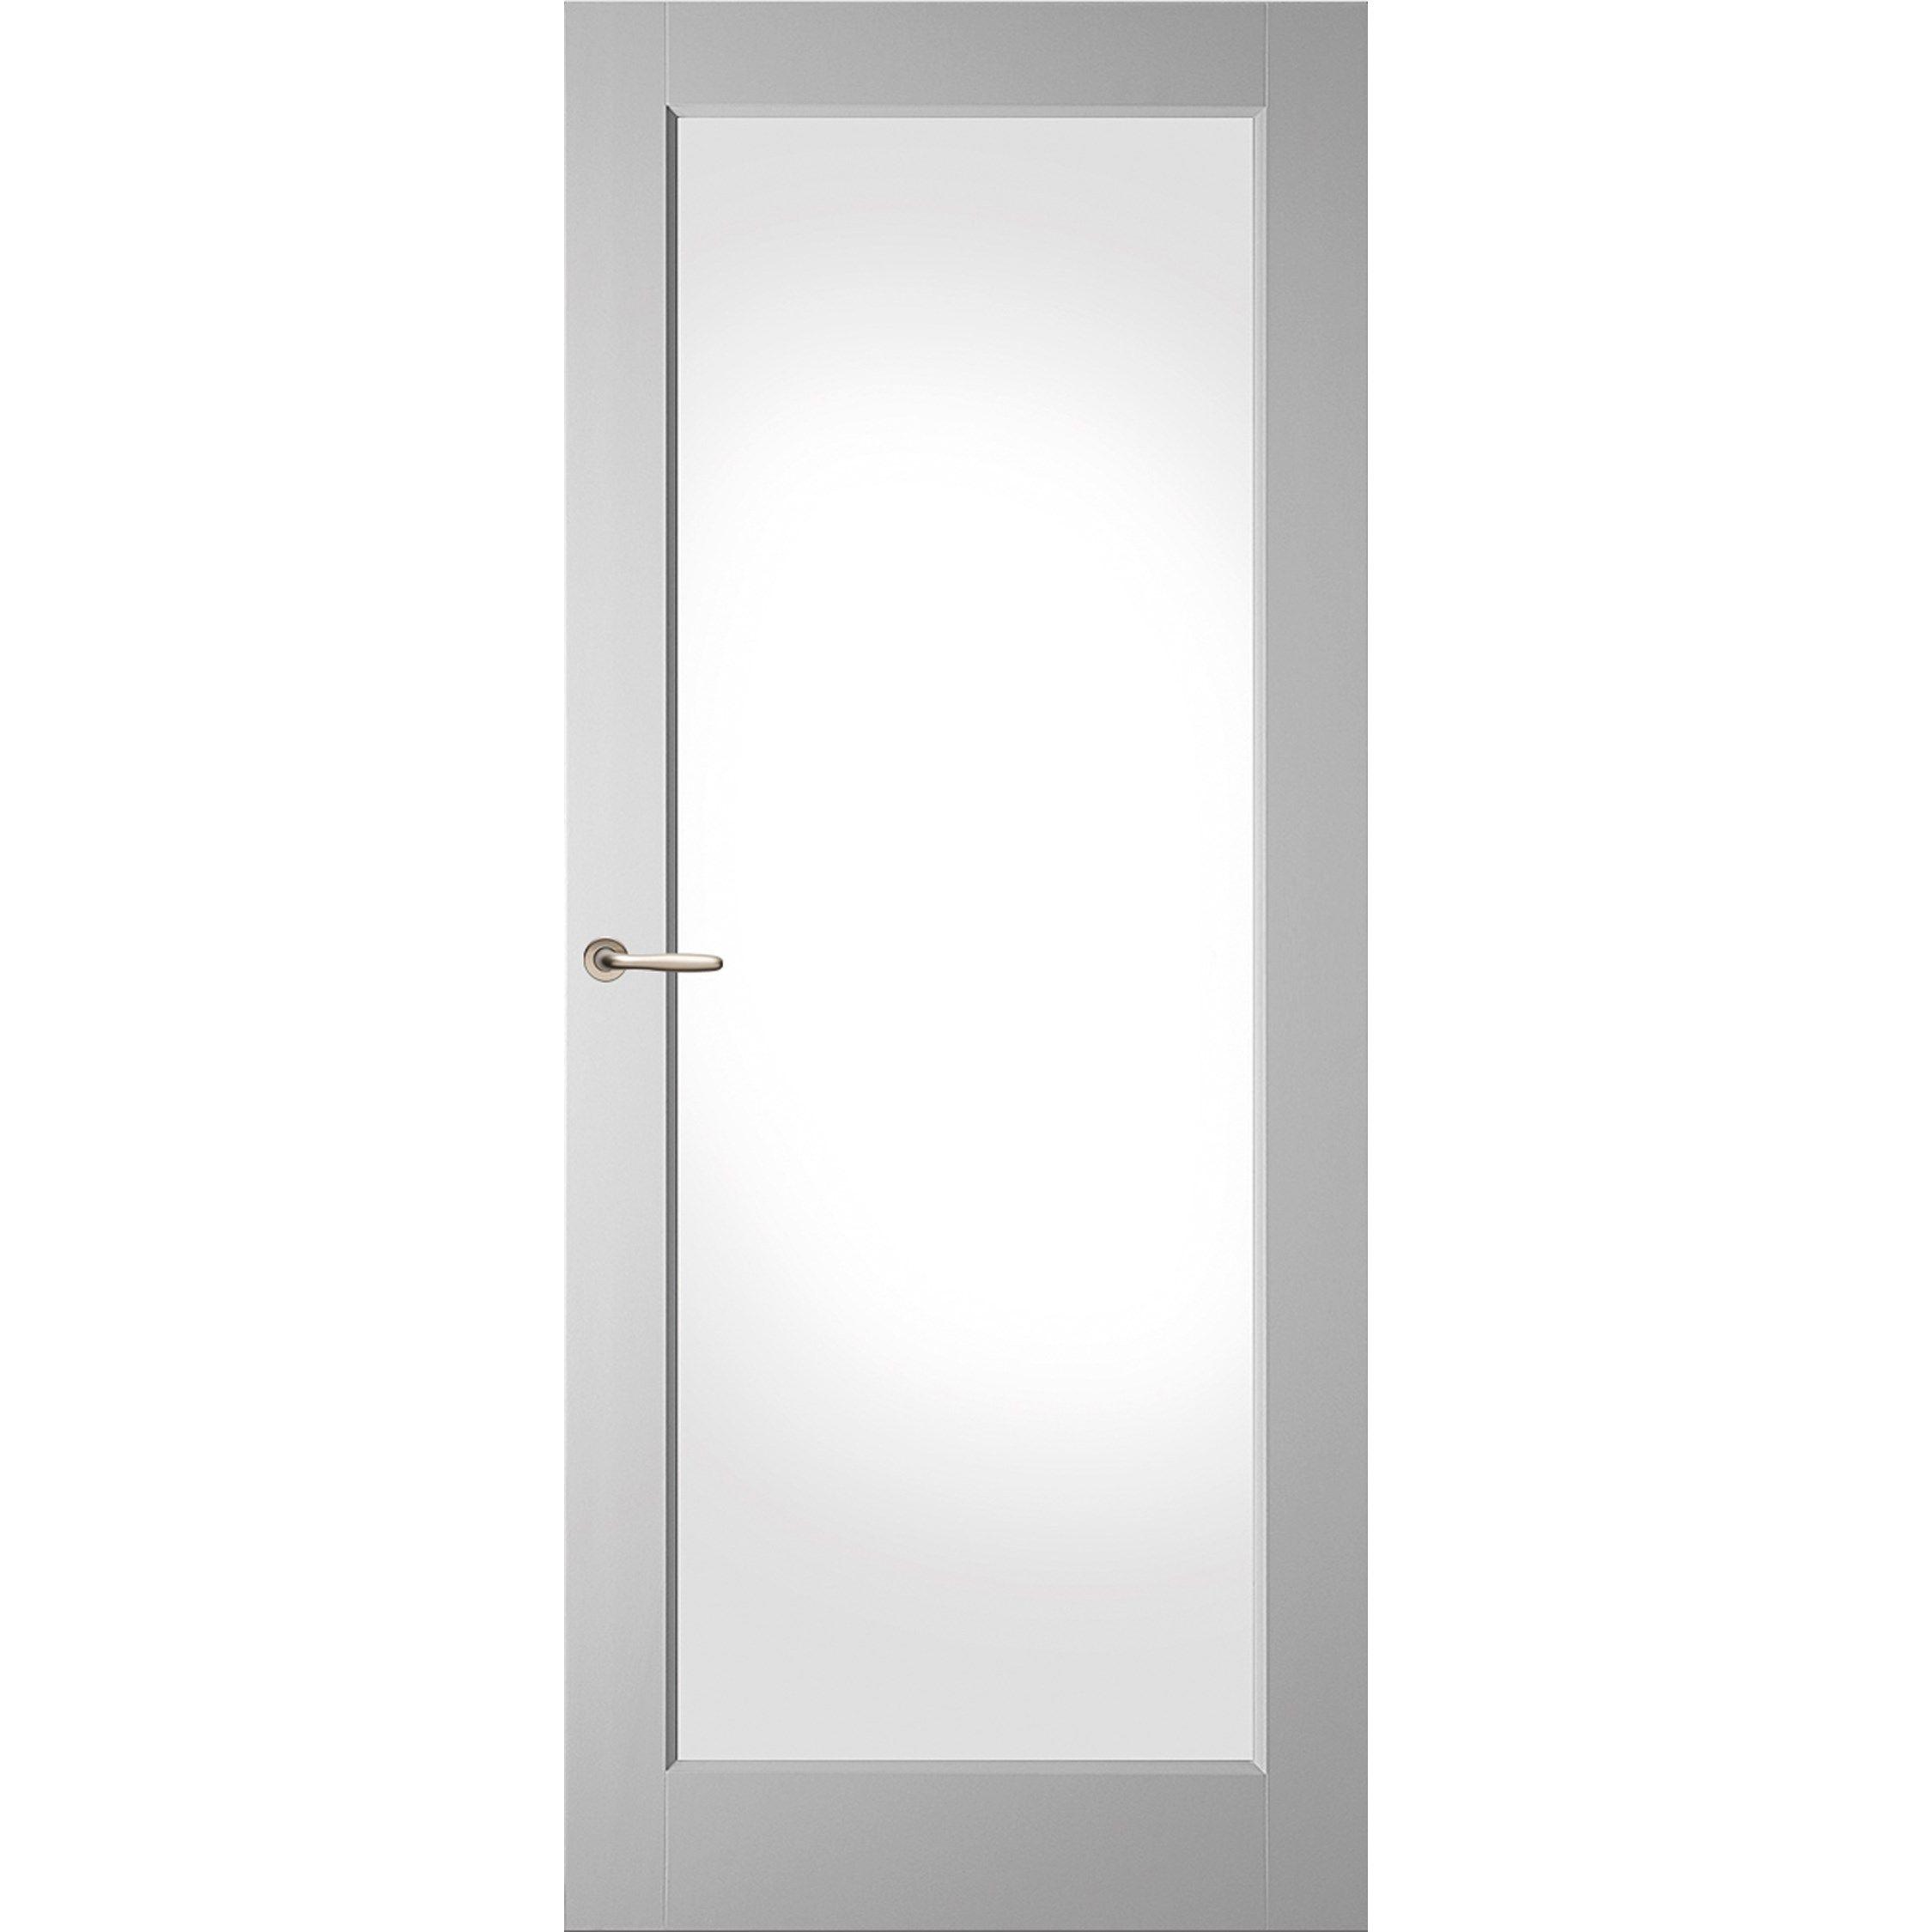 Binnendeur Met Glas Opdek.Deze Binnendeur Heeft Een Facetprofiel En Is Verkrijgbaar In